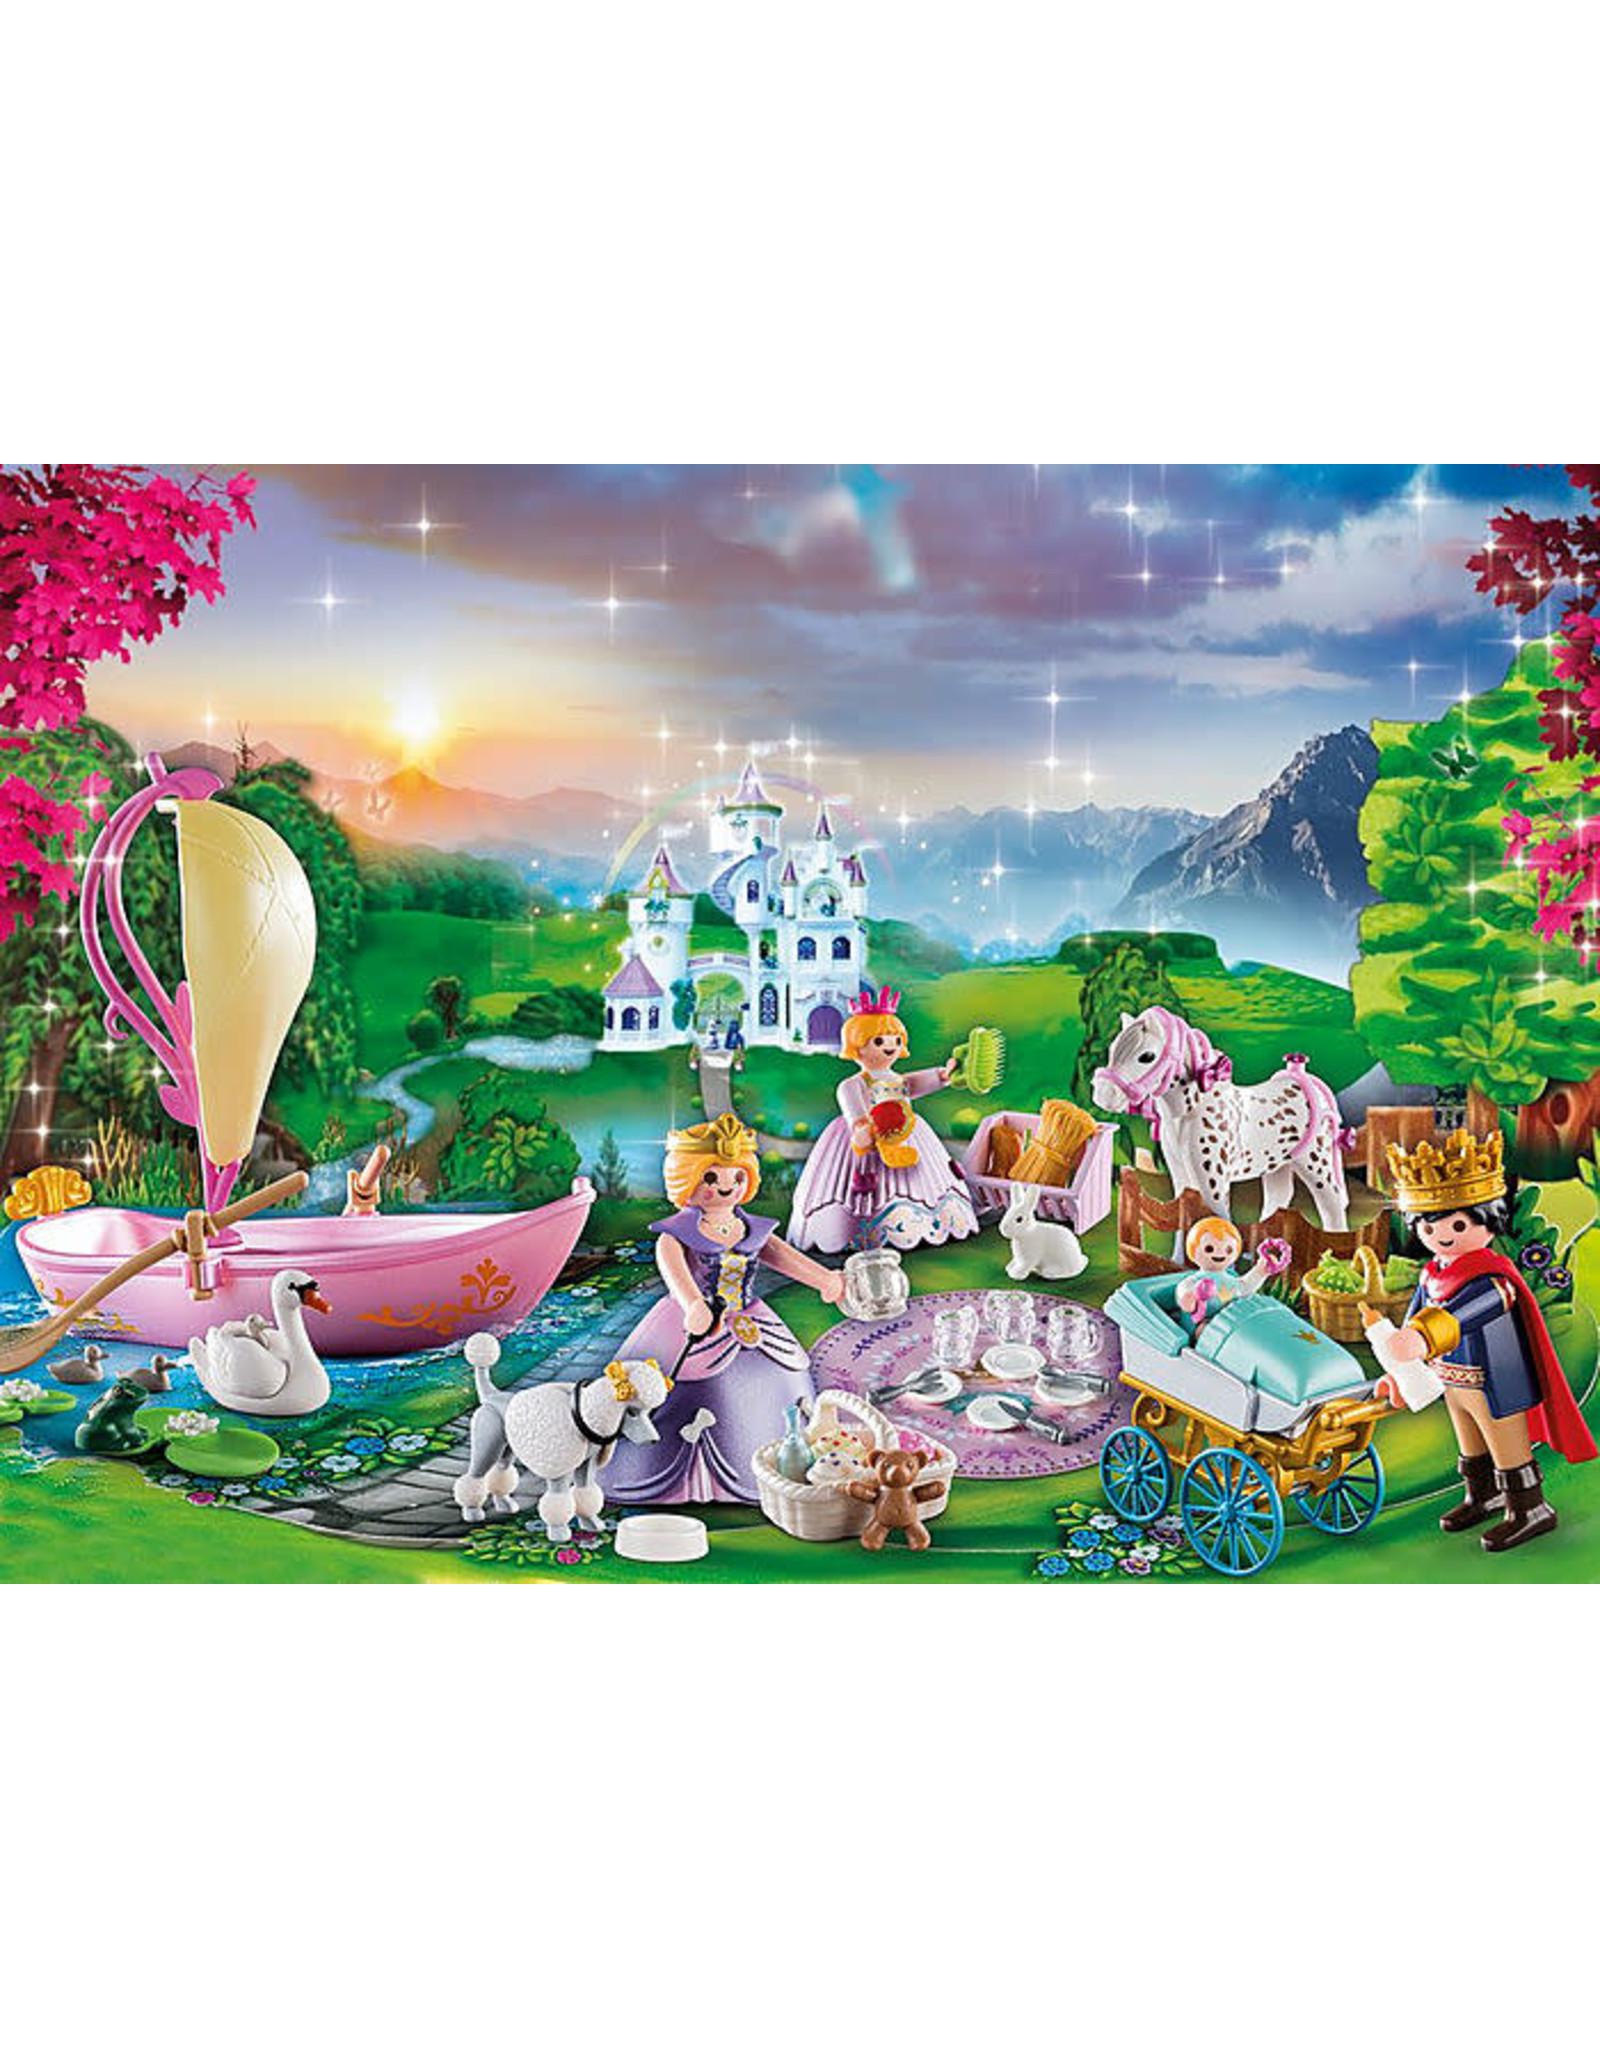 Playmobil Advent Calendar, Royal Picnic